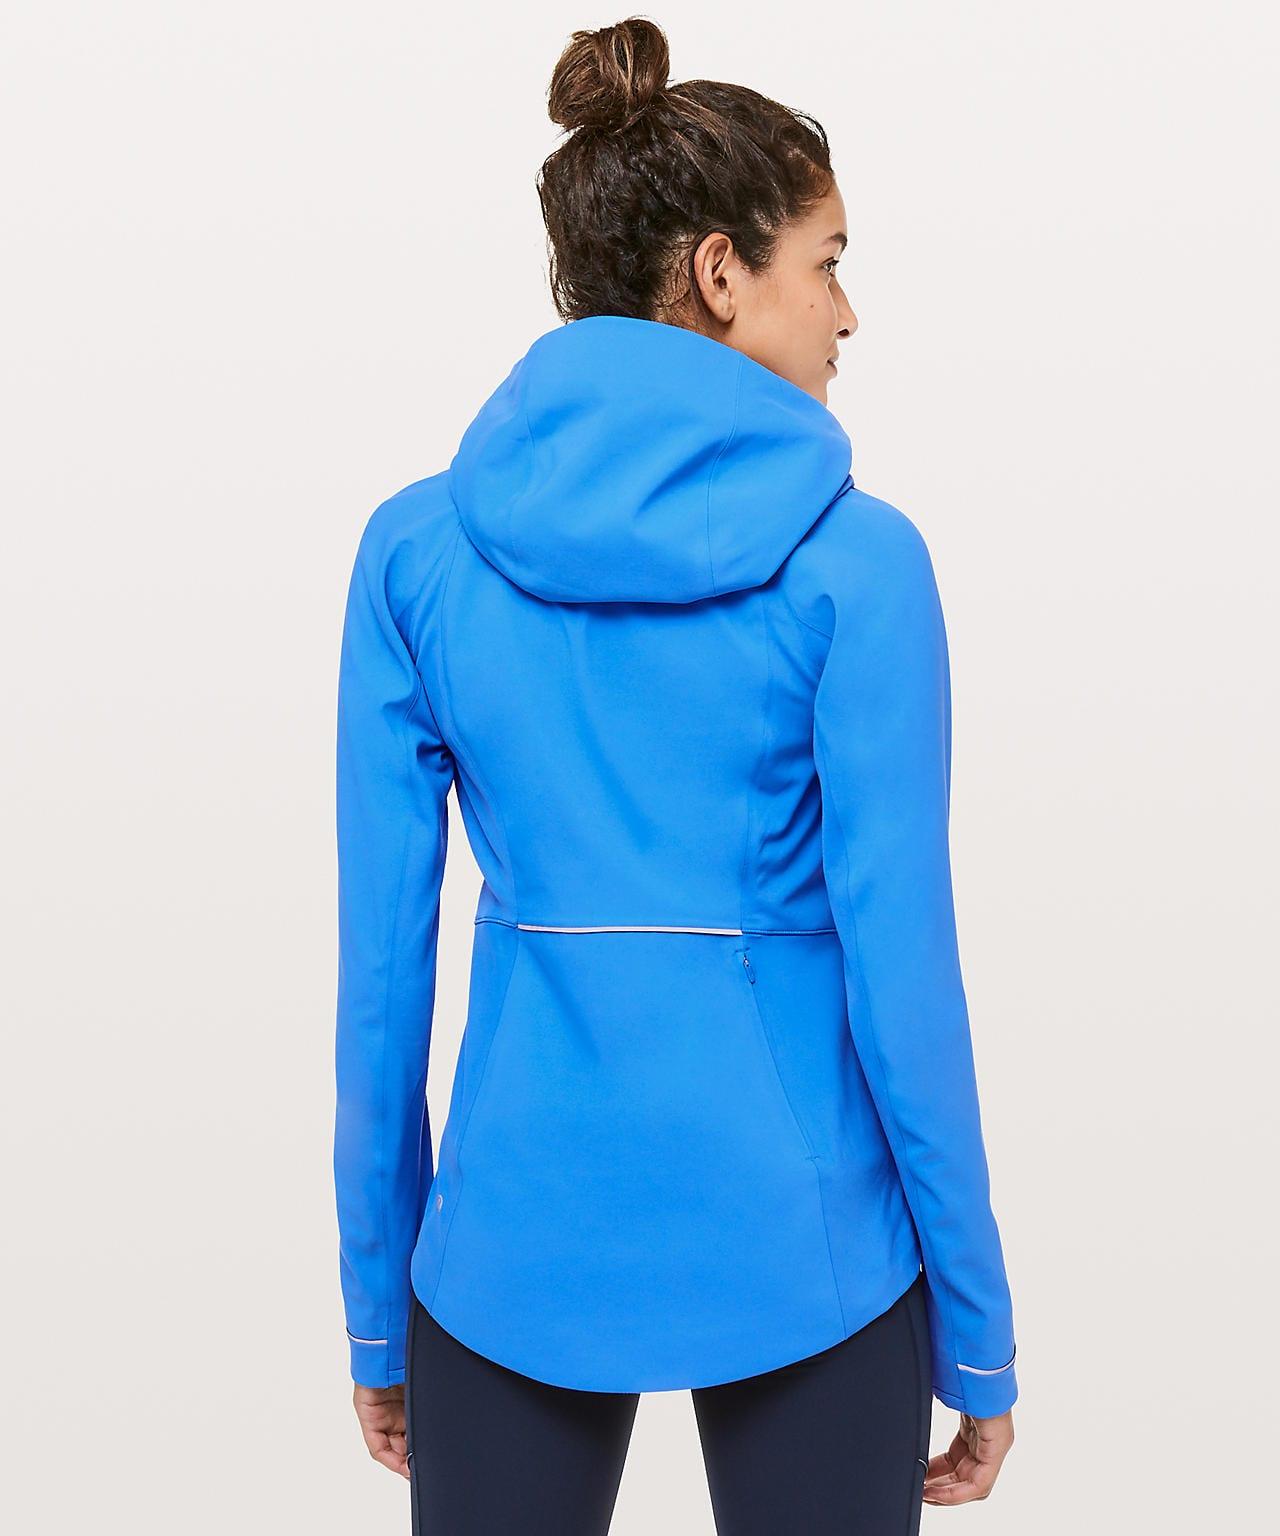 Cross Chill Jacket